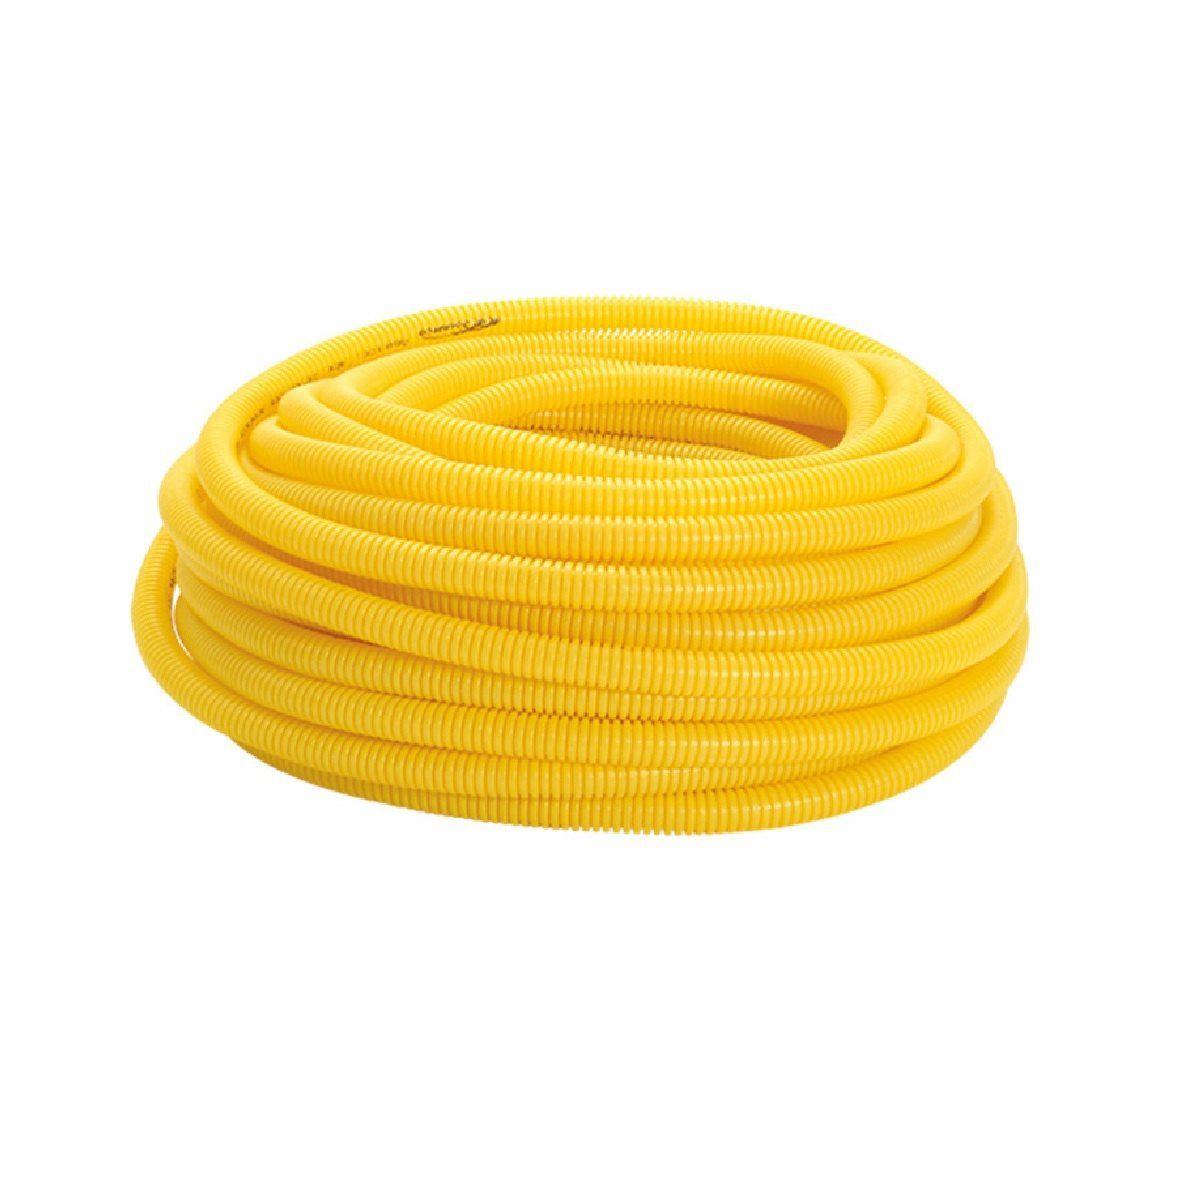 Eletroduto Conduite Amanco Conrrugado - Amarelo